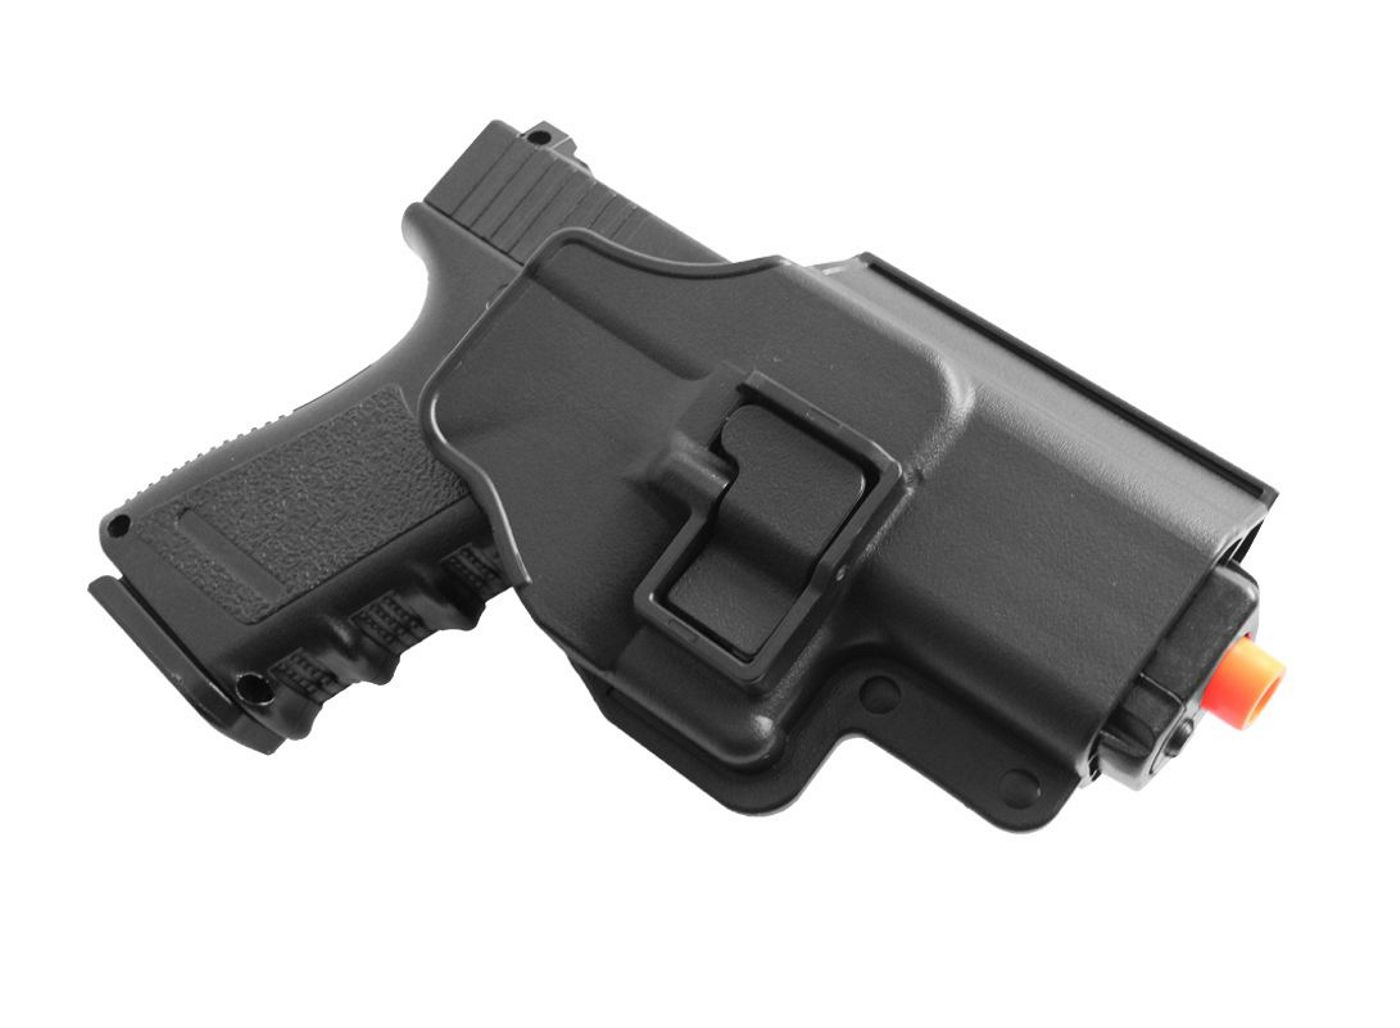 Pistola Airsoft Galaxy G15+ Full Metal Spring com Coldre Rígido